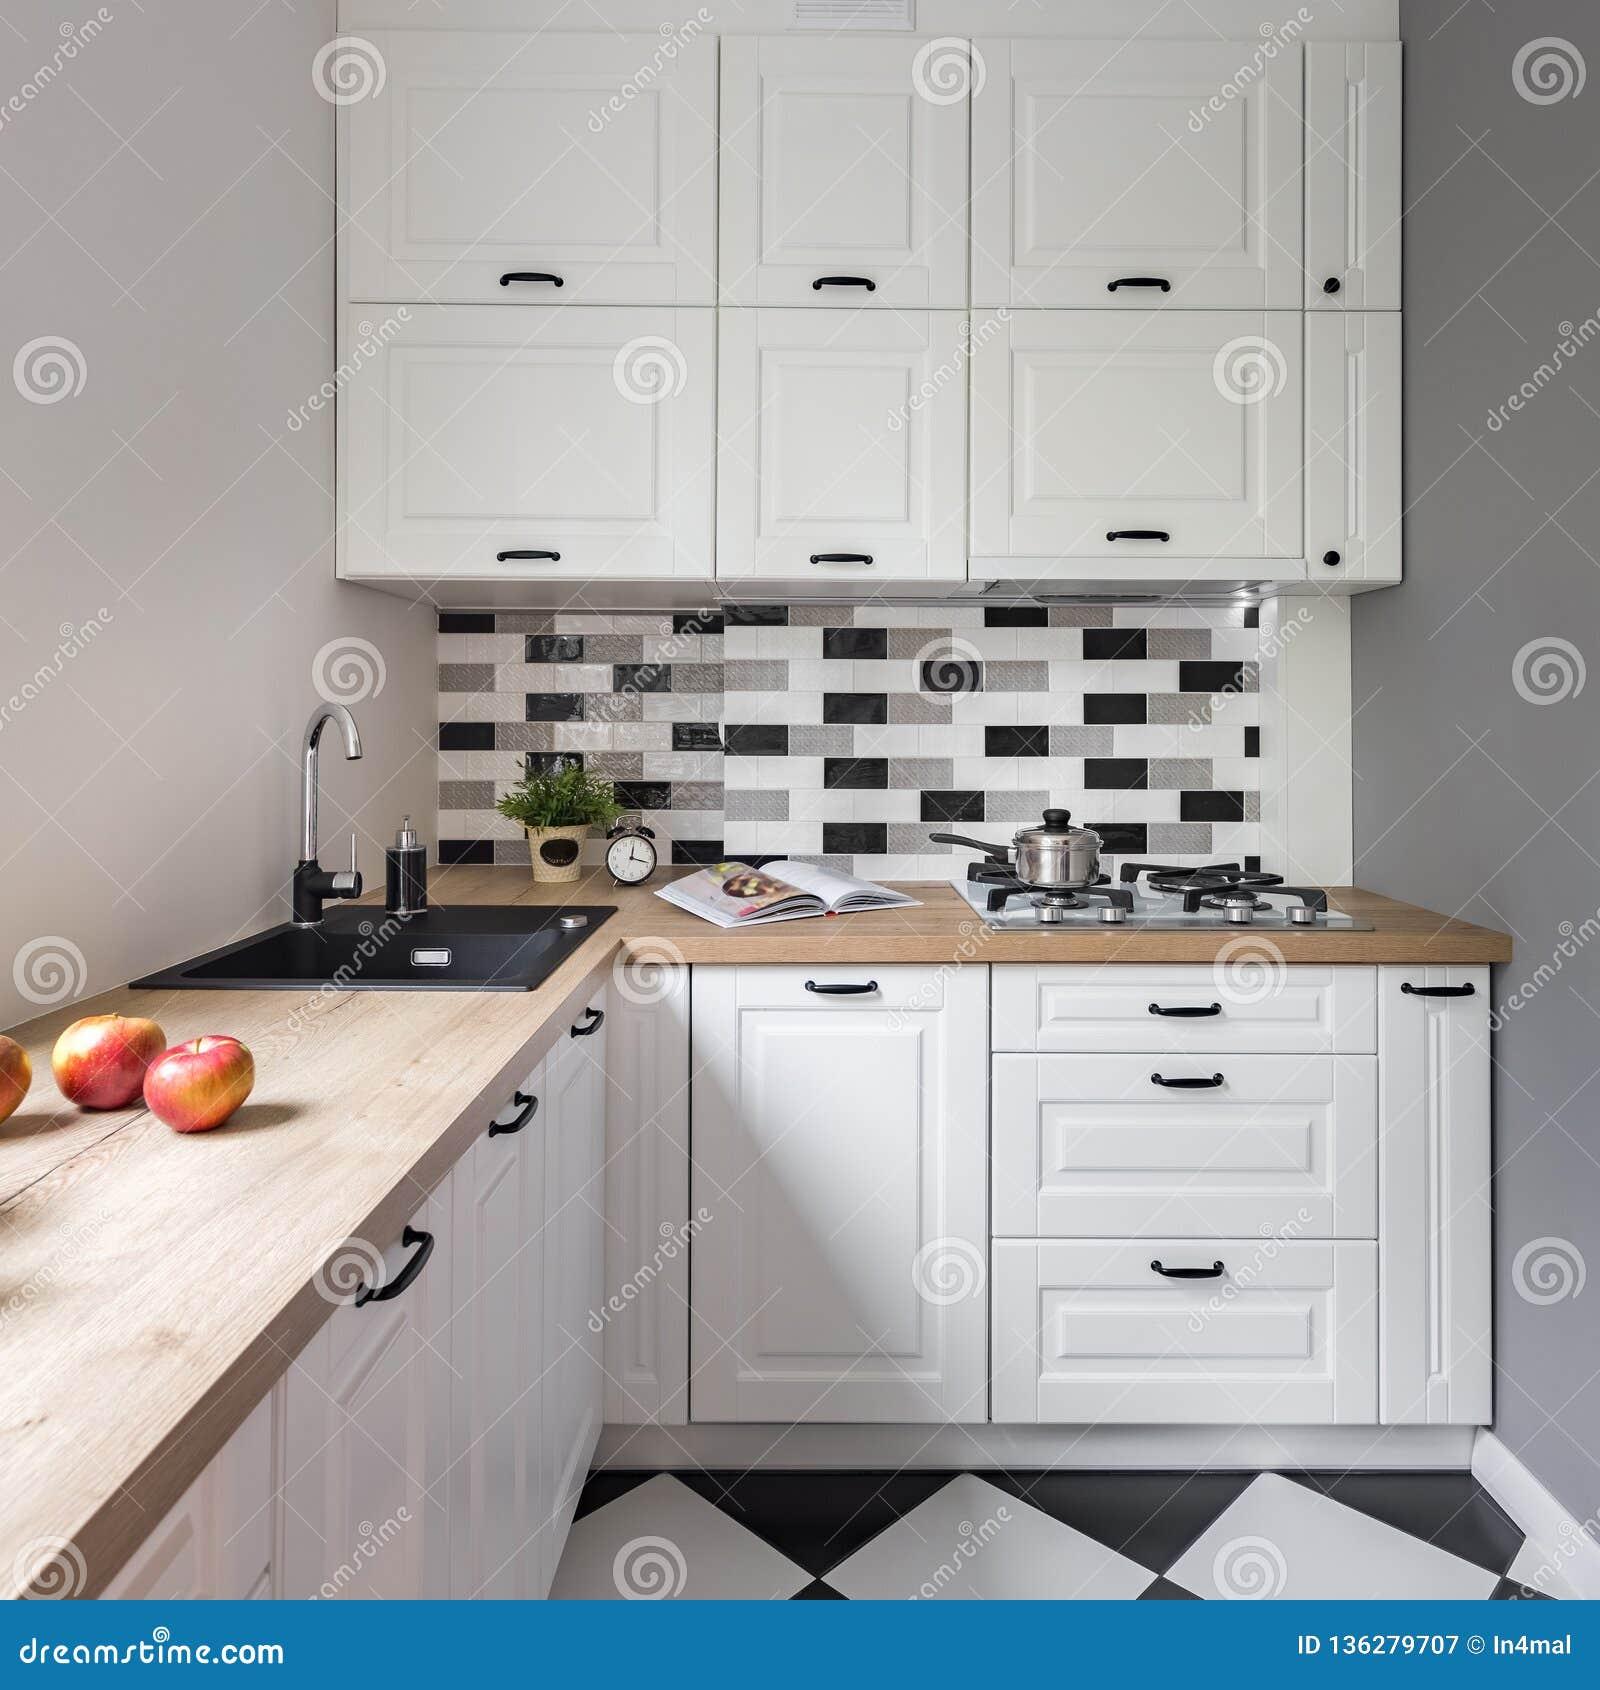 Mala Kuchnia Z Bialym Meble Obraz Stock Obraz Zlozonej Z Meble